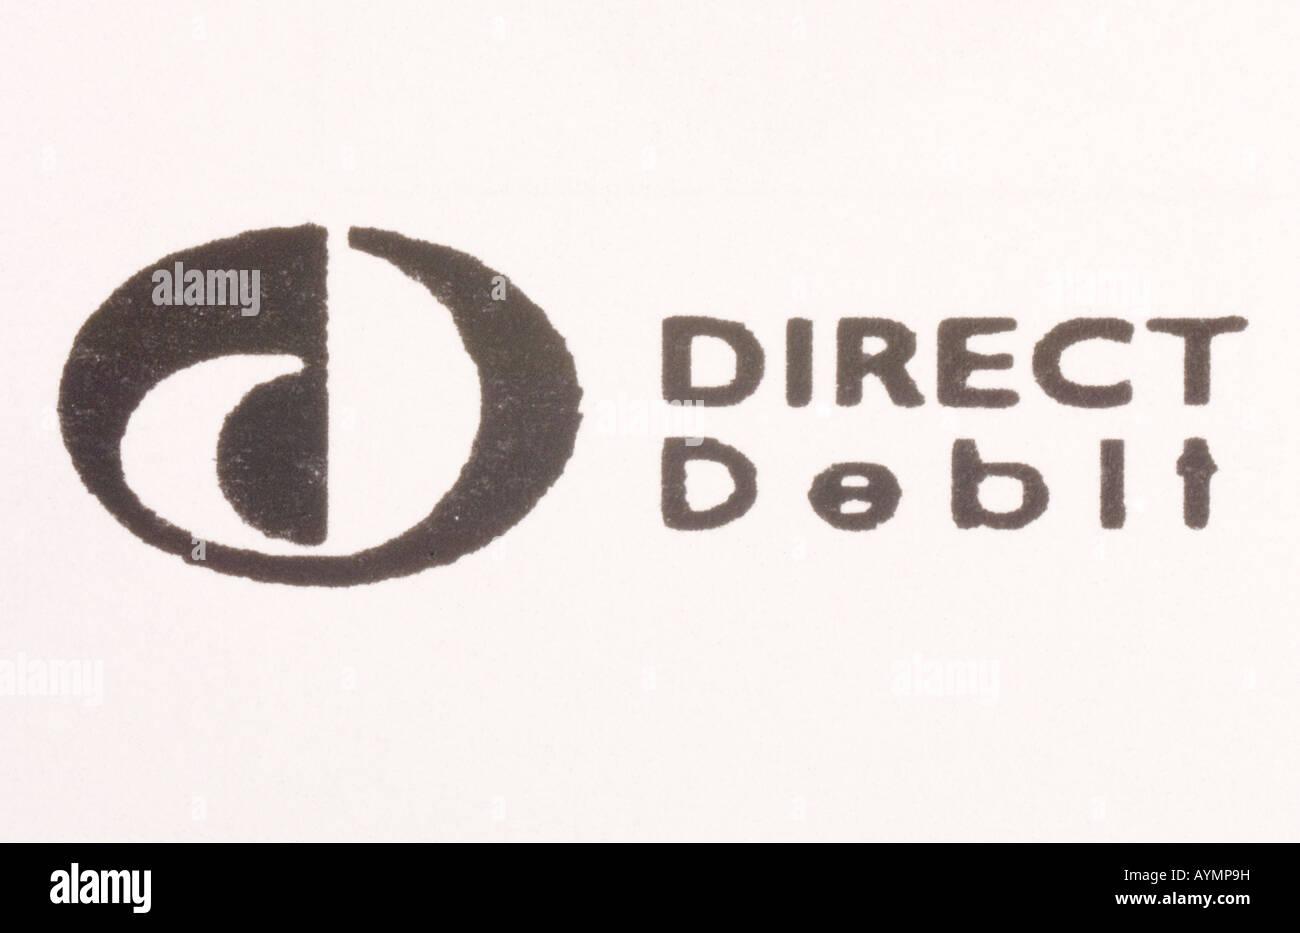 Direct Debit Logo - Stock Image